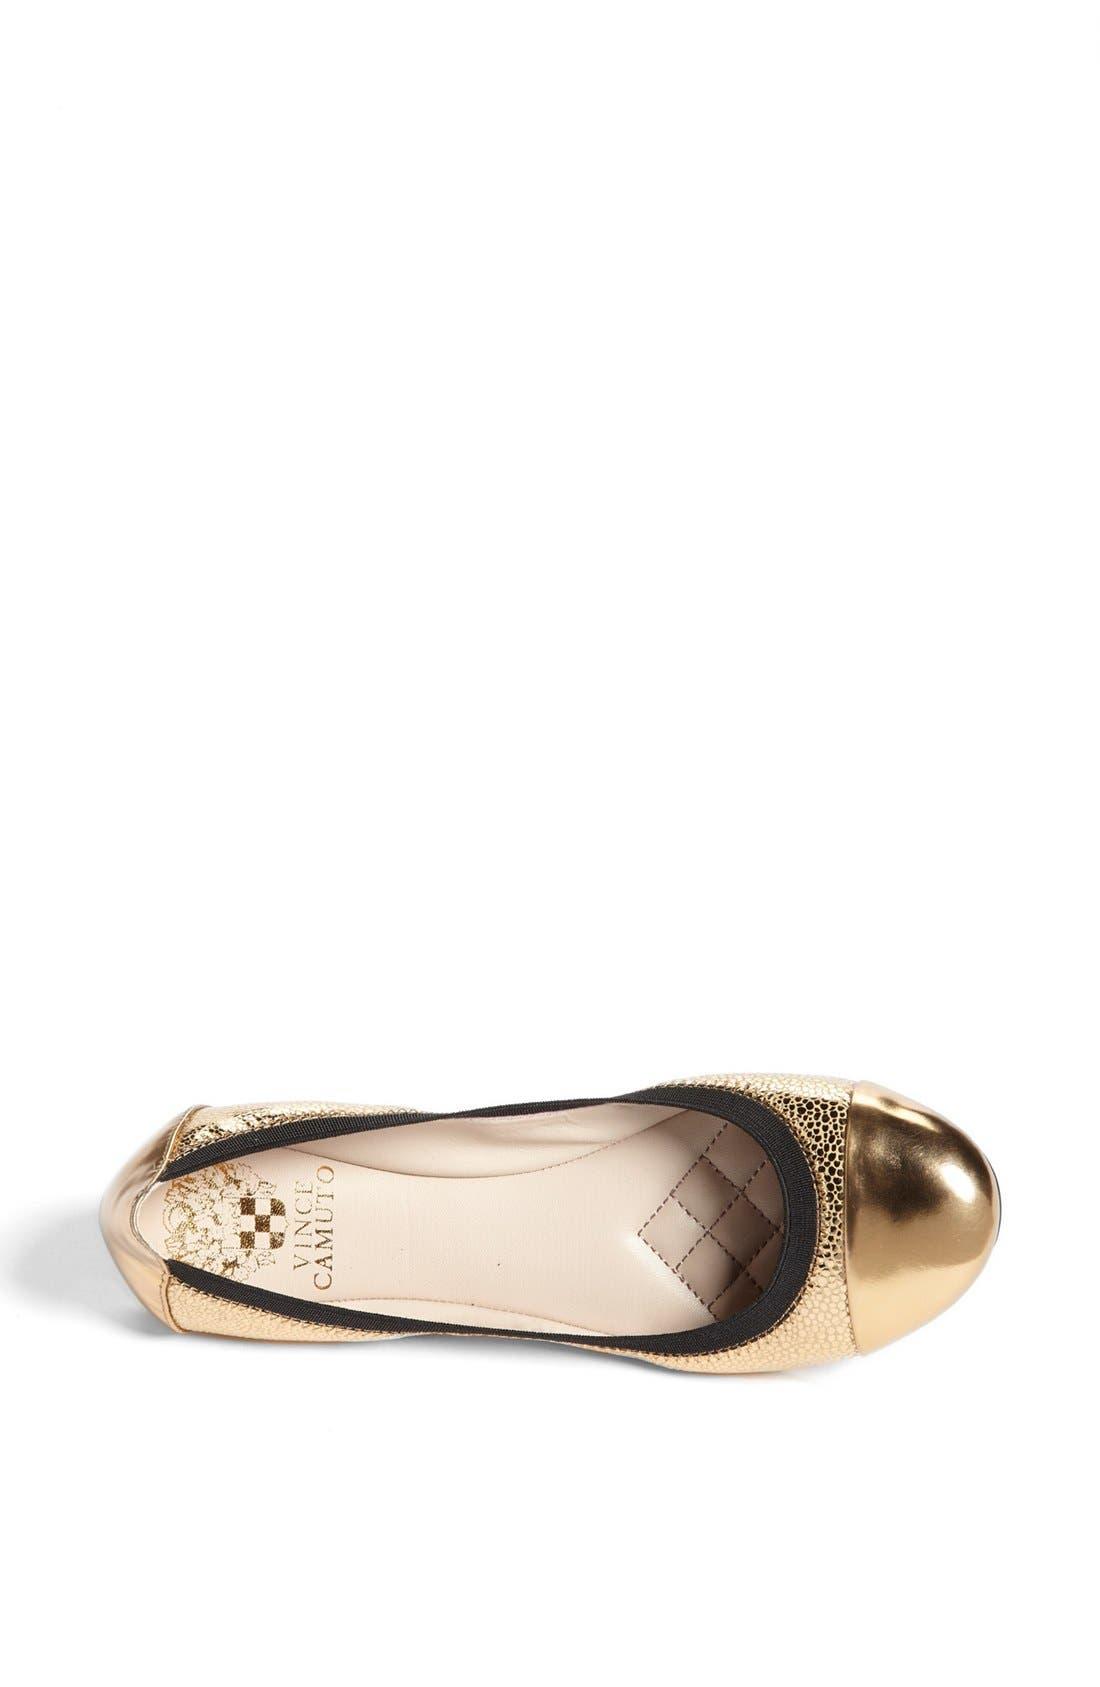 Alternate Image 3  - Vince Camuto 'Elisee' Leather Ballet Flat